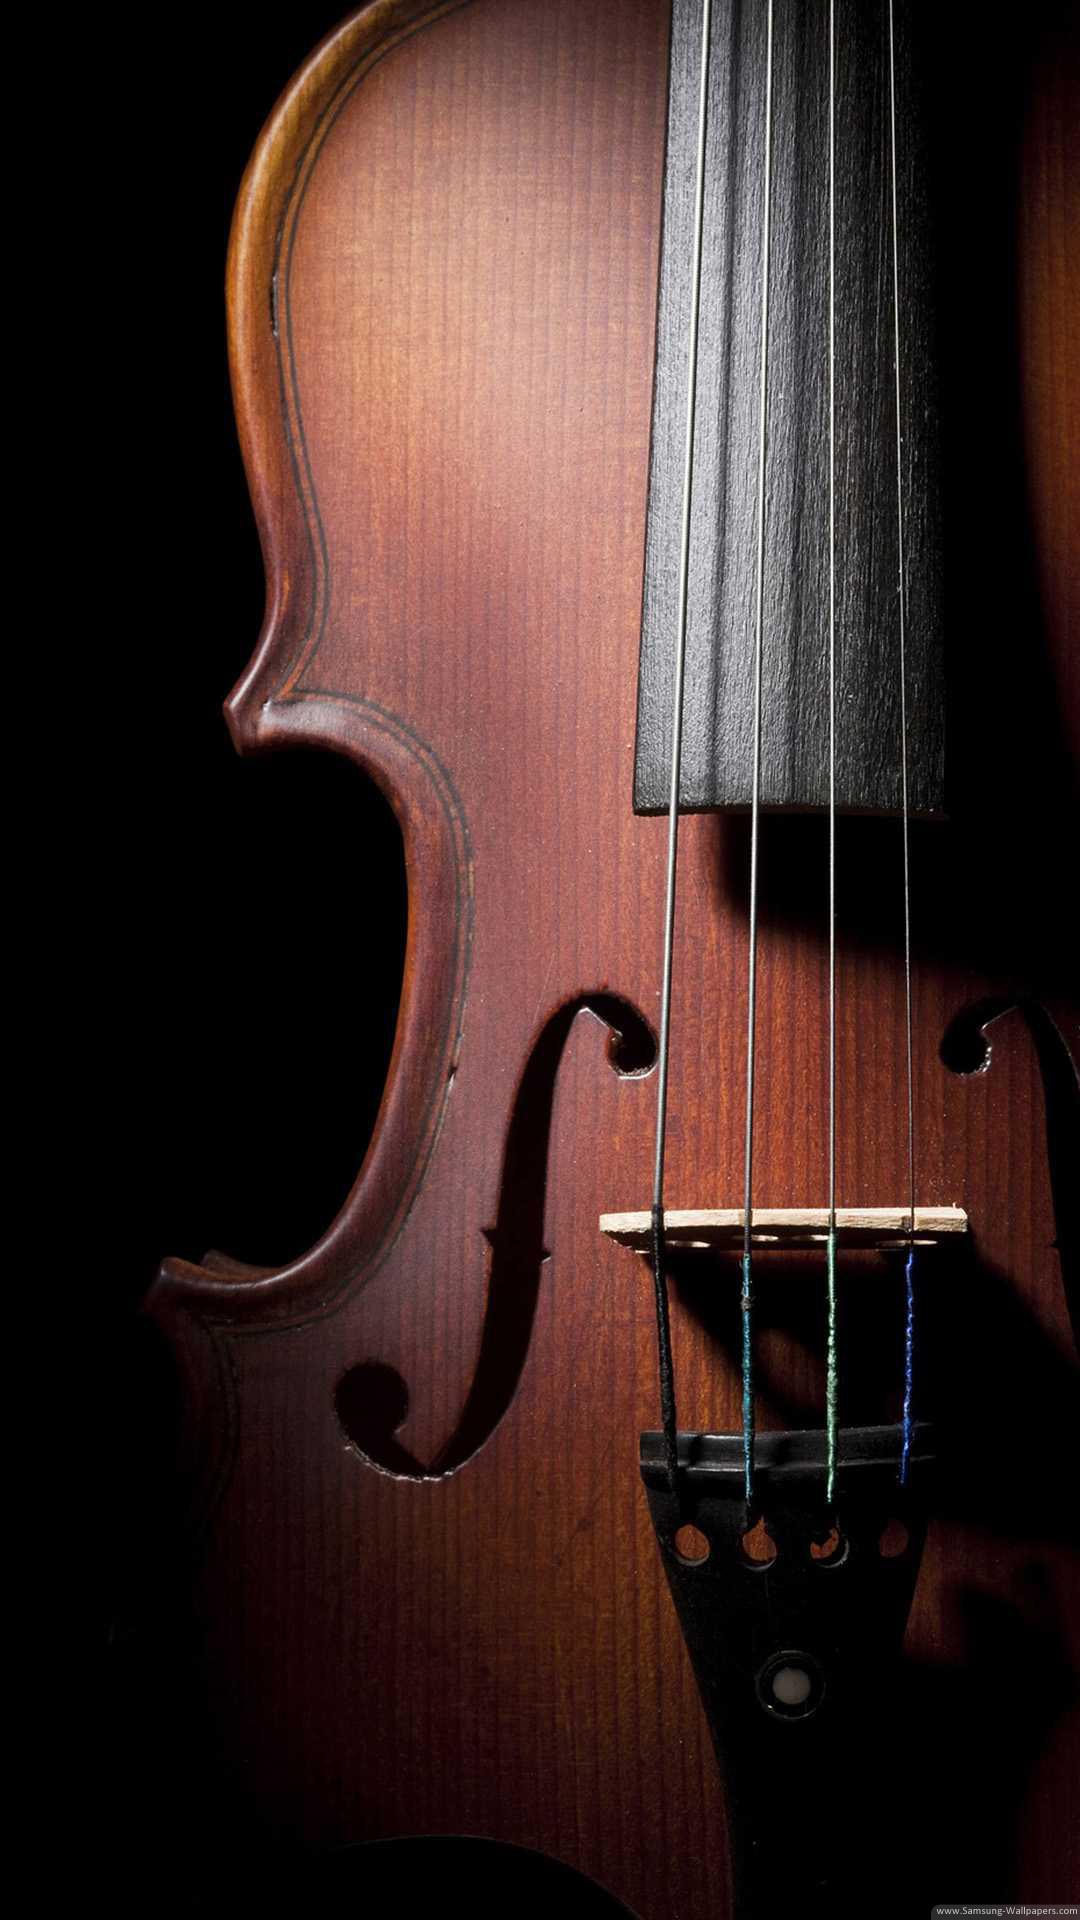 Violin Stock Samsung Galaxy S5 Wallpaper HD